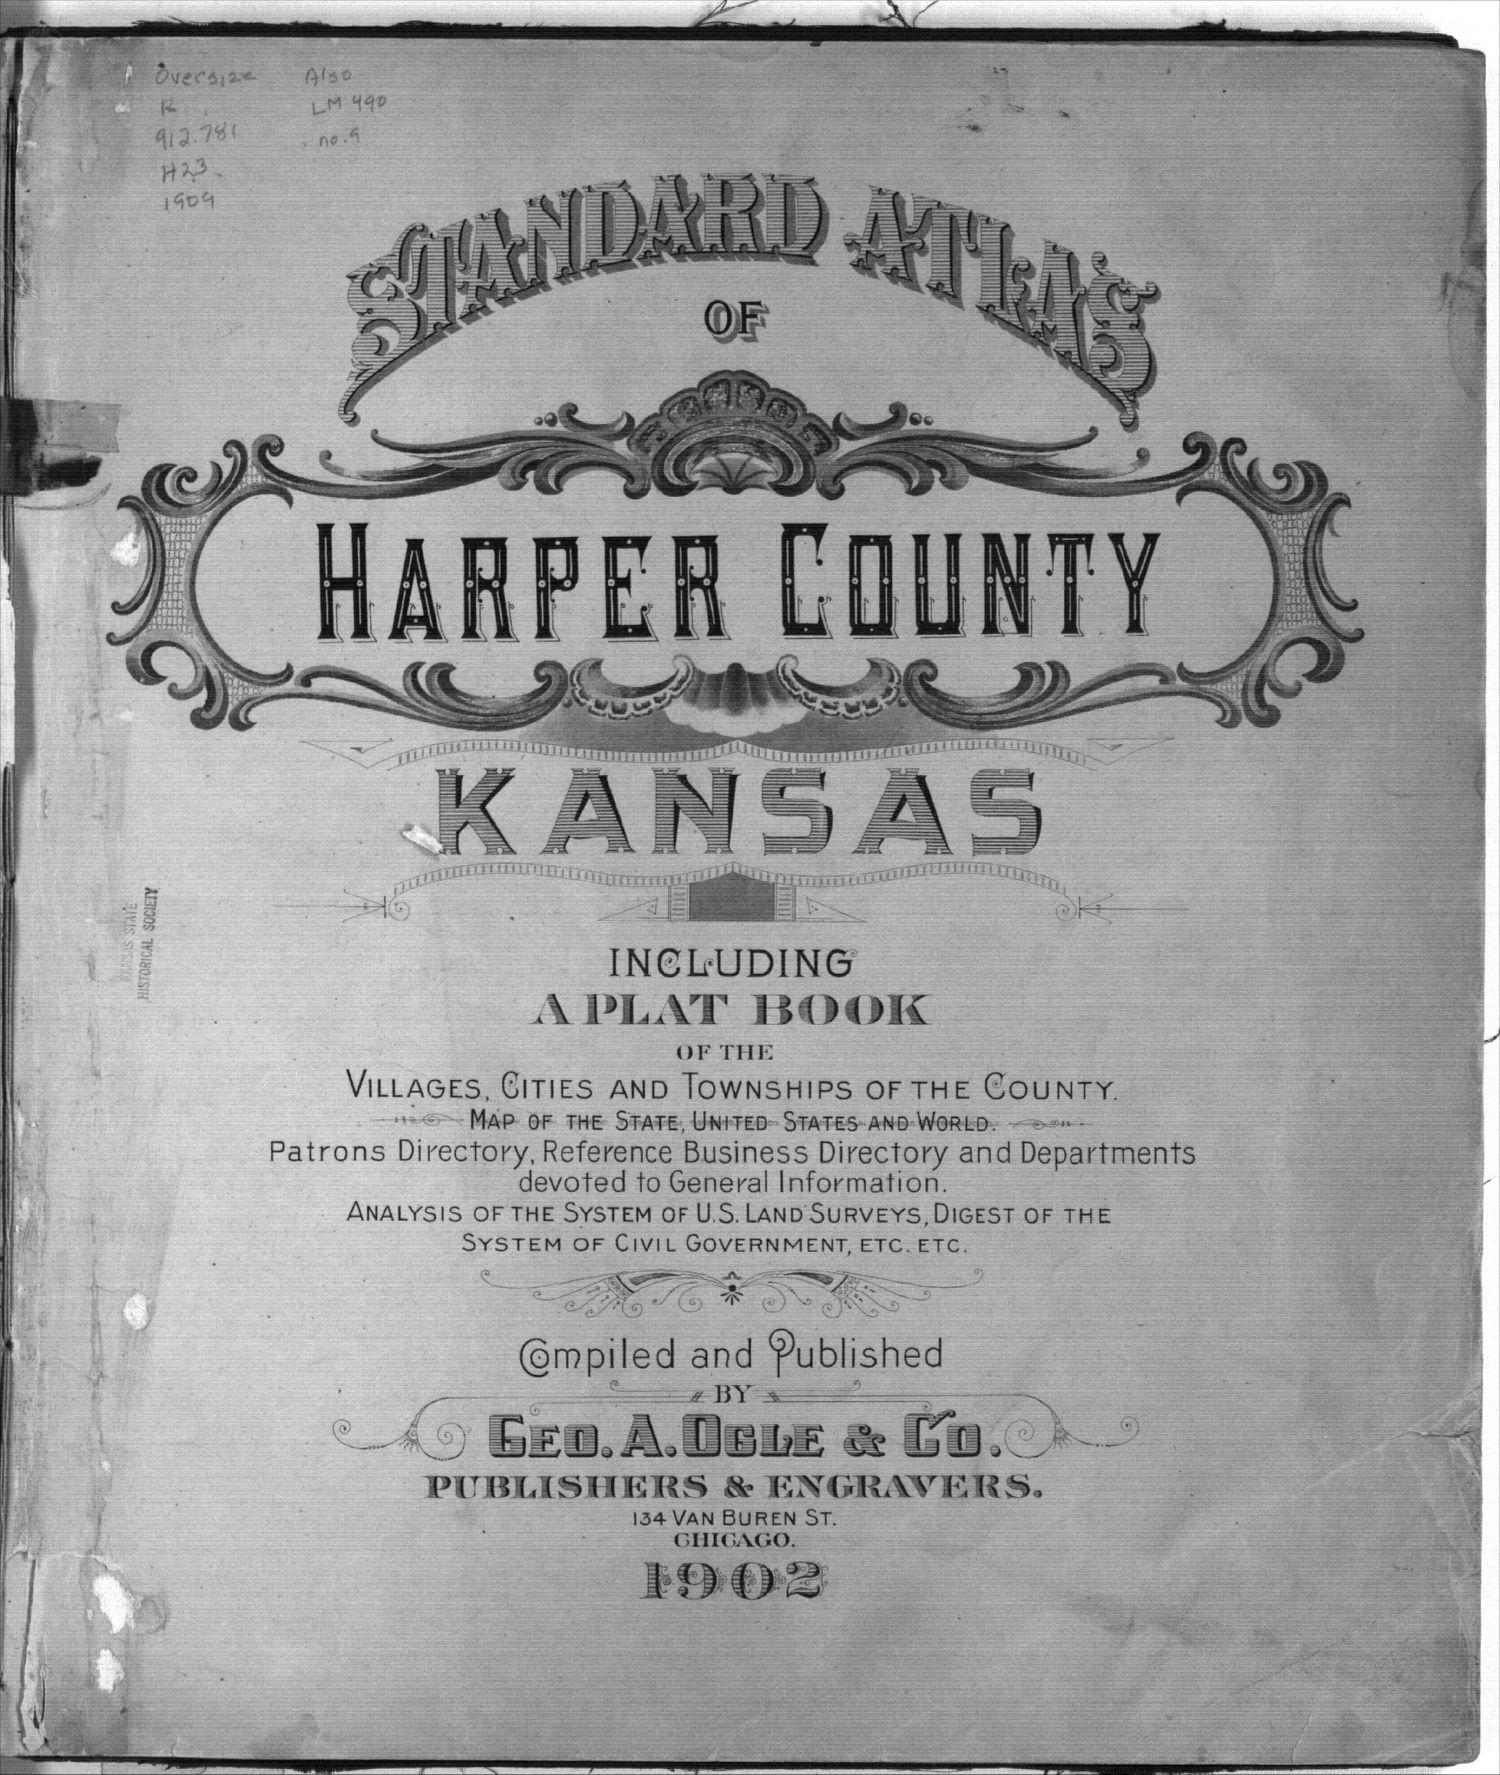 Standard atlas of Harper County, Kansas - Title Page